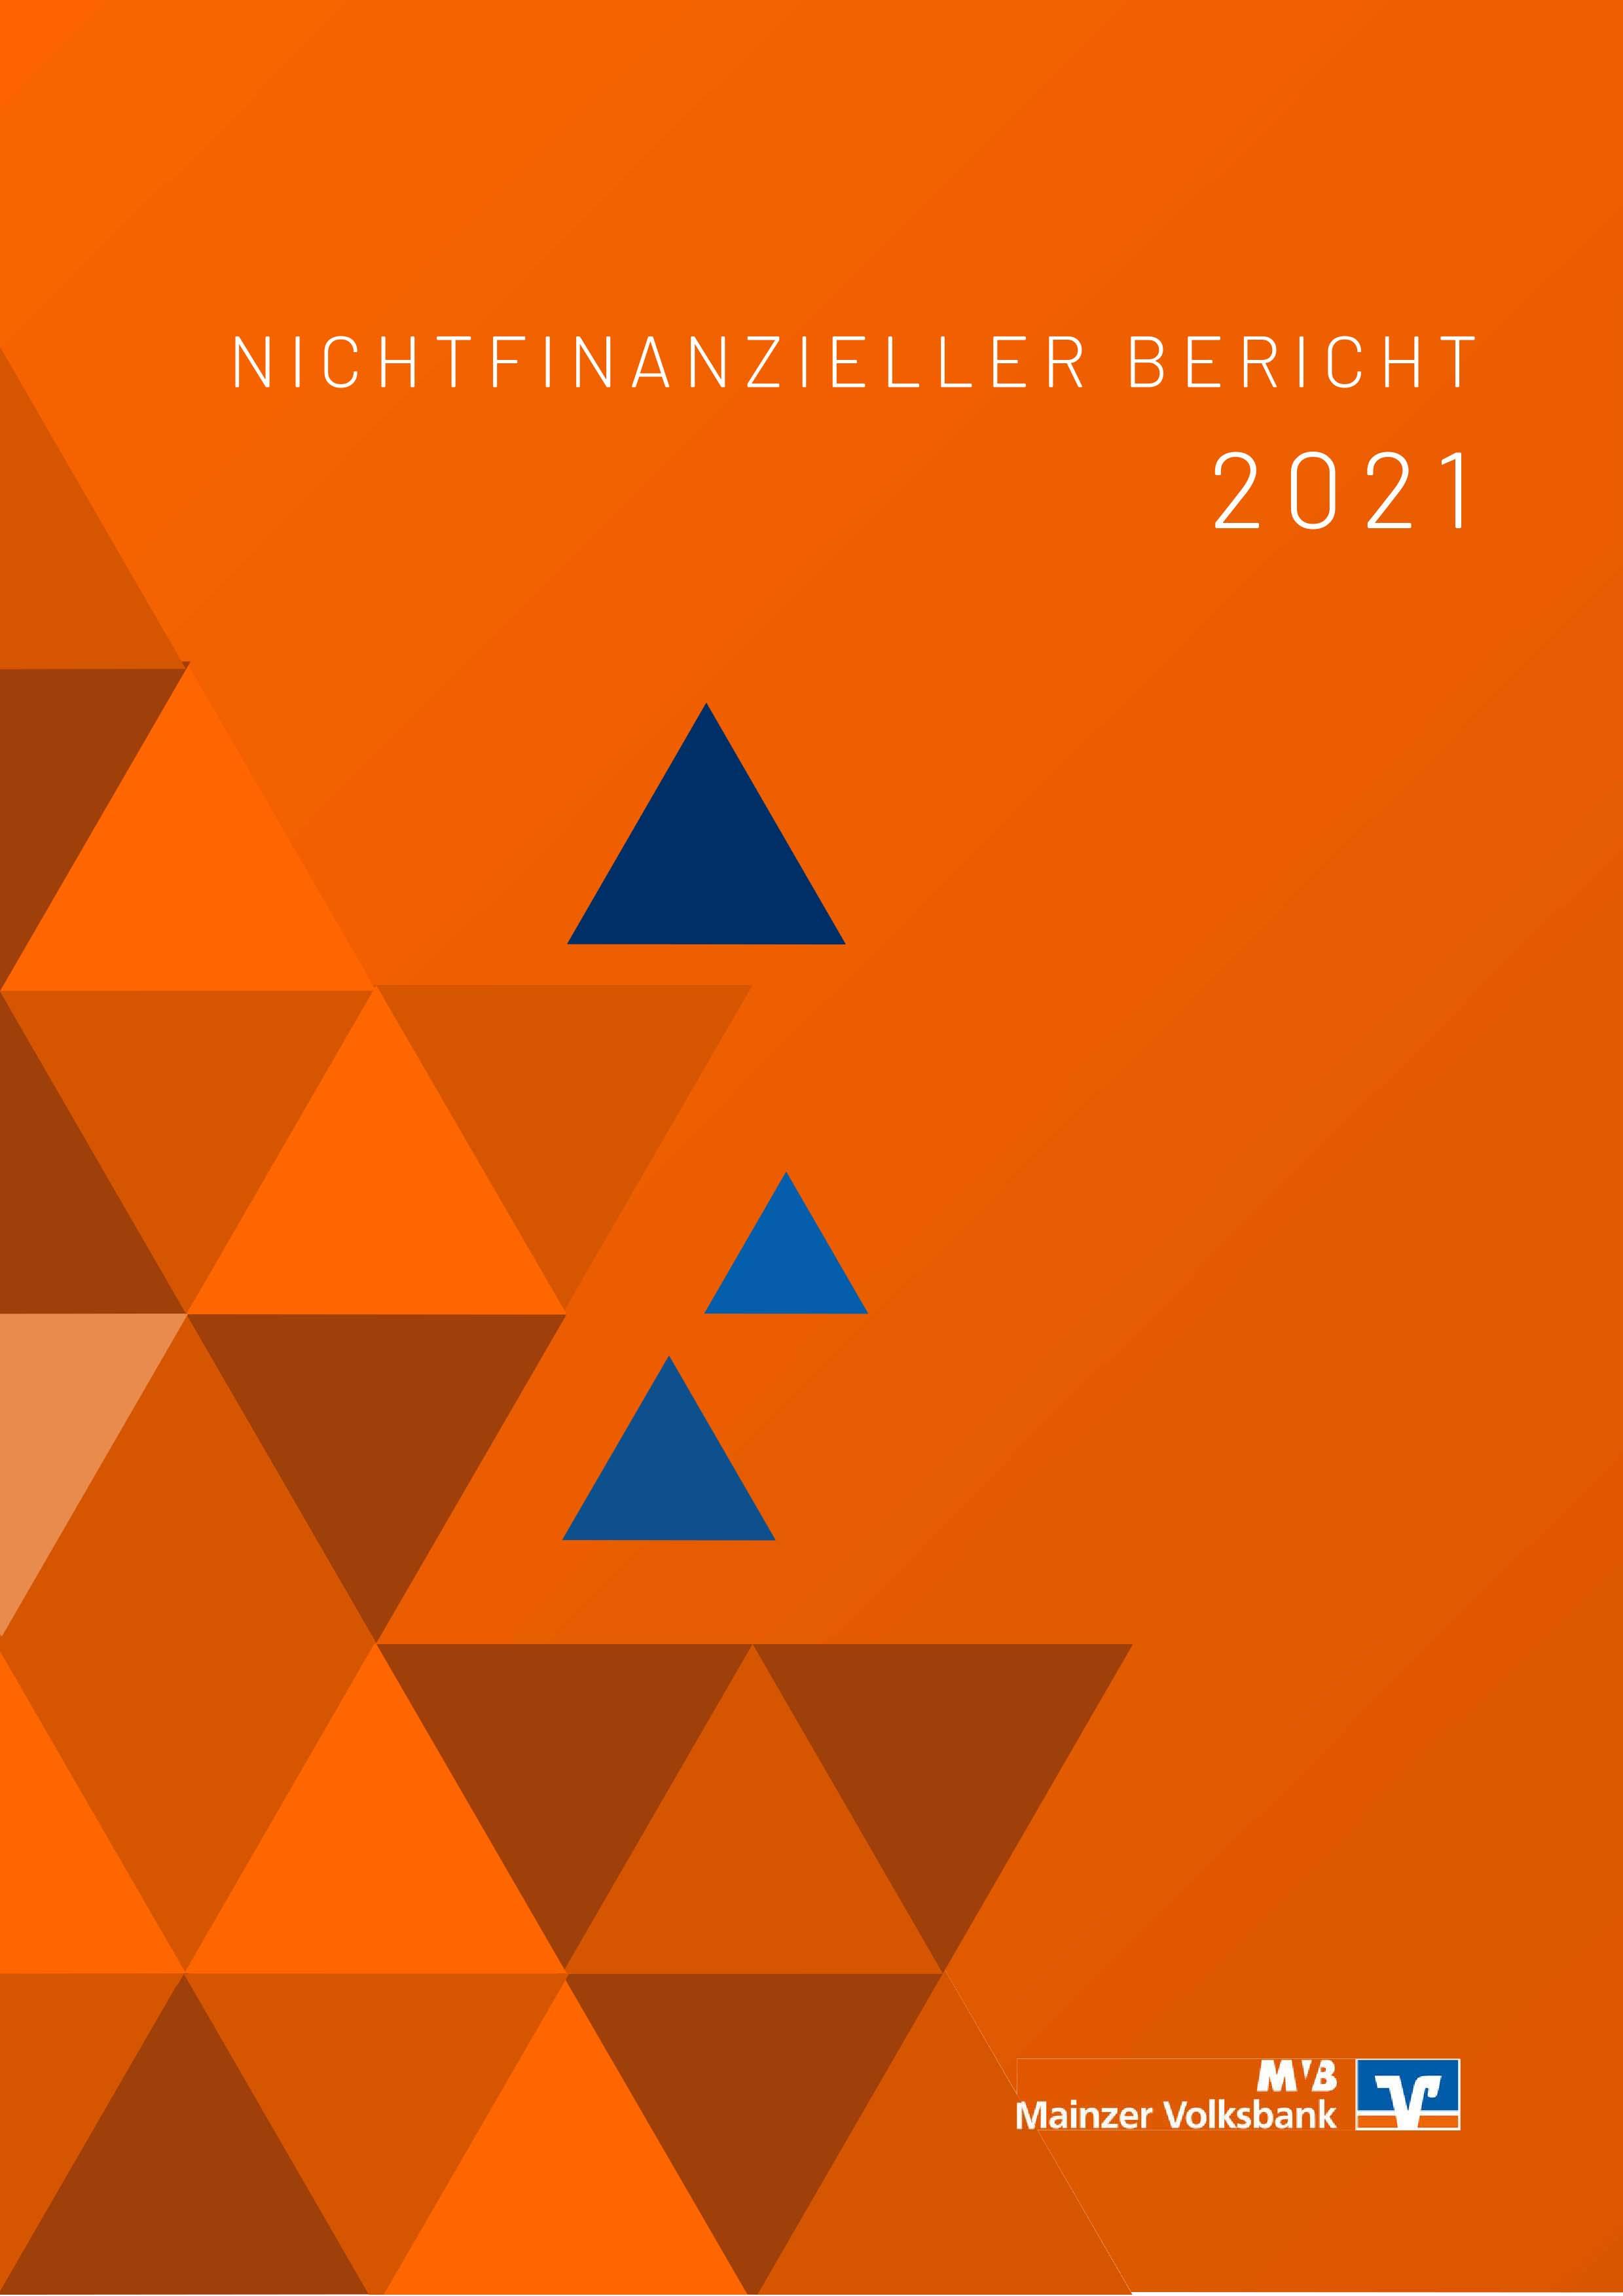 Nichtfinanzieller Bericht MVB 2017